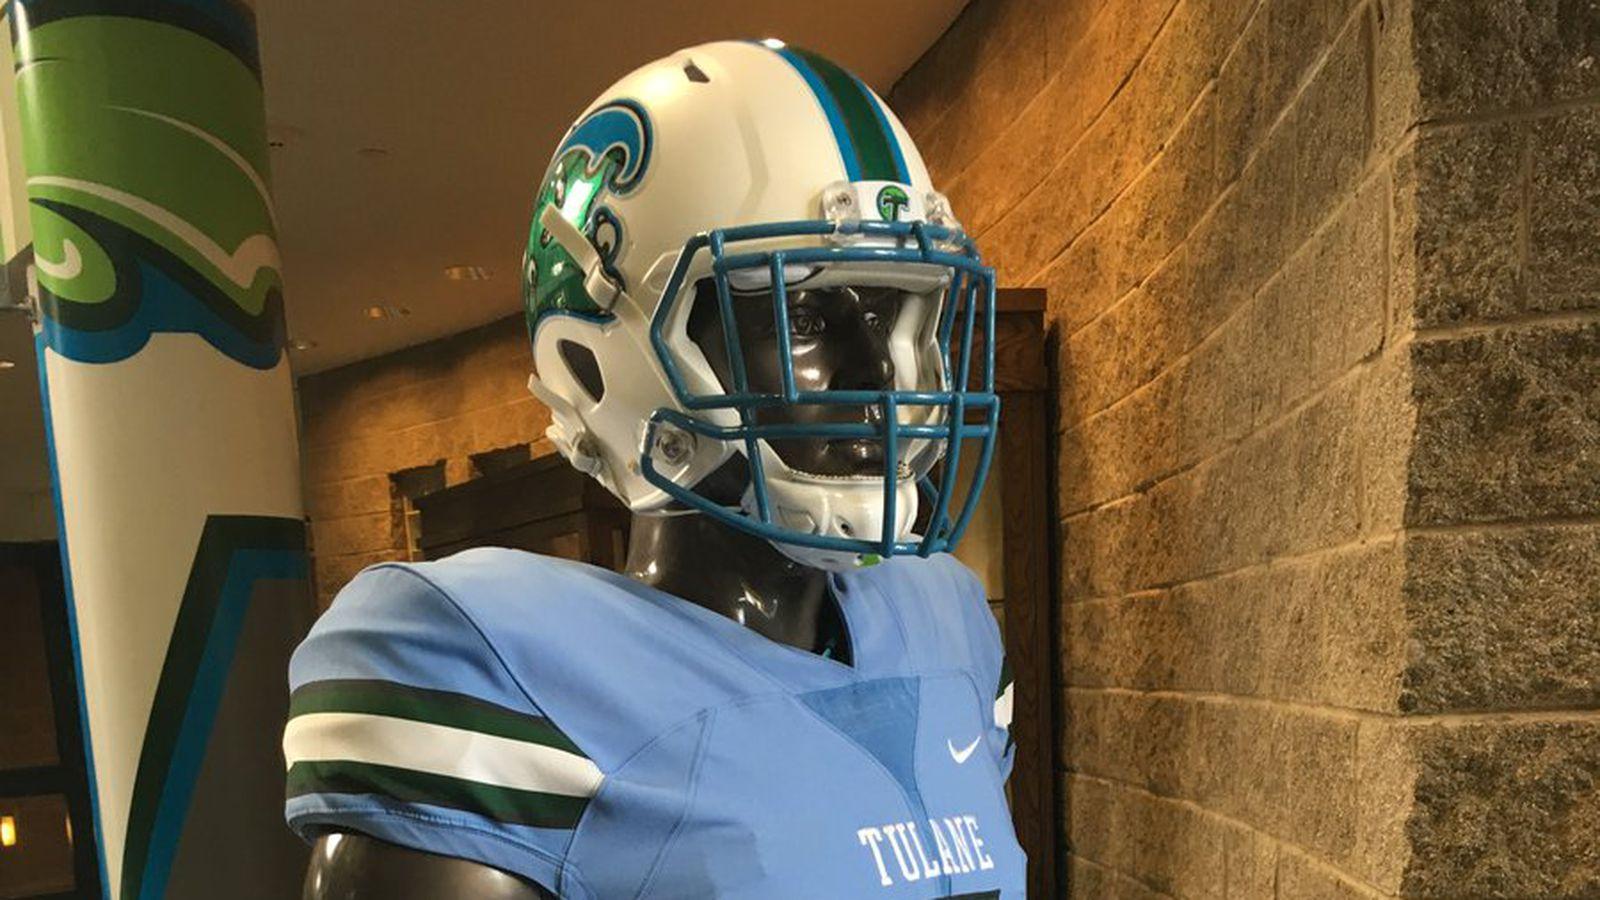 Tulane's set to debut these gorgeous sky-blue uniforms